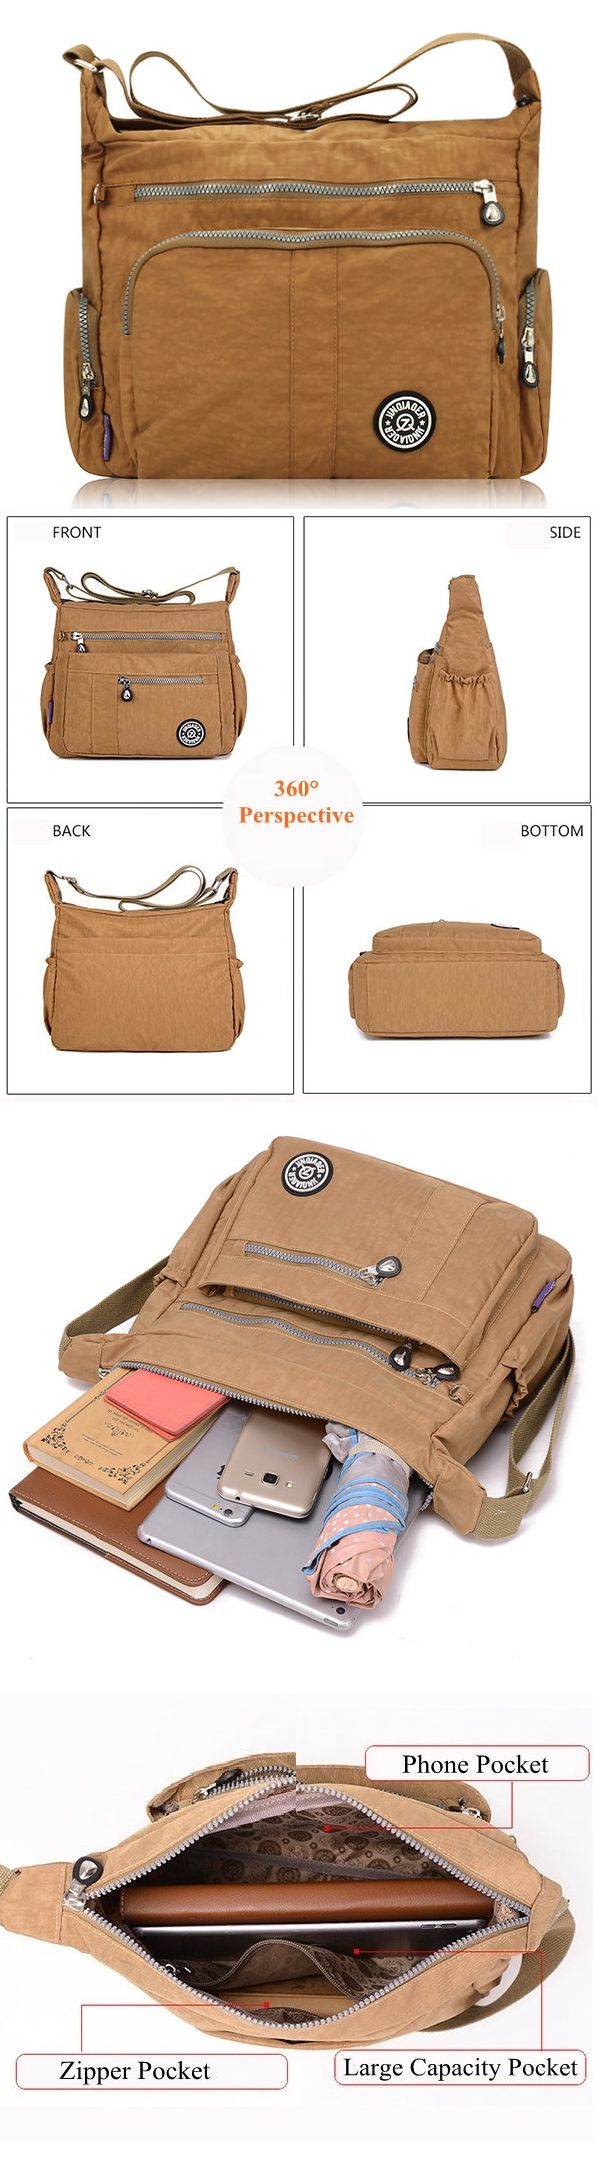 Women Nylon Casual Waterproof Multi-pocket Shoulder Bags Crossbody Bags